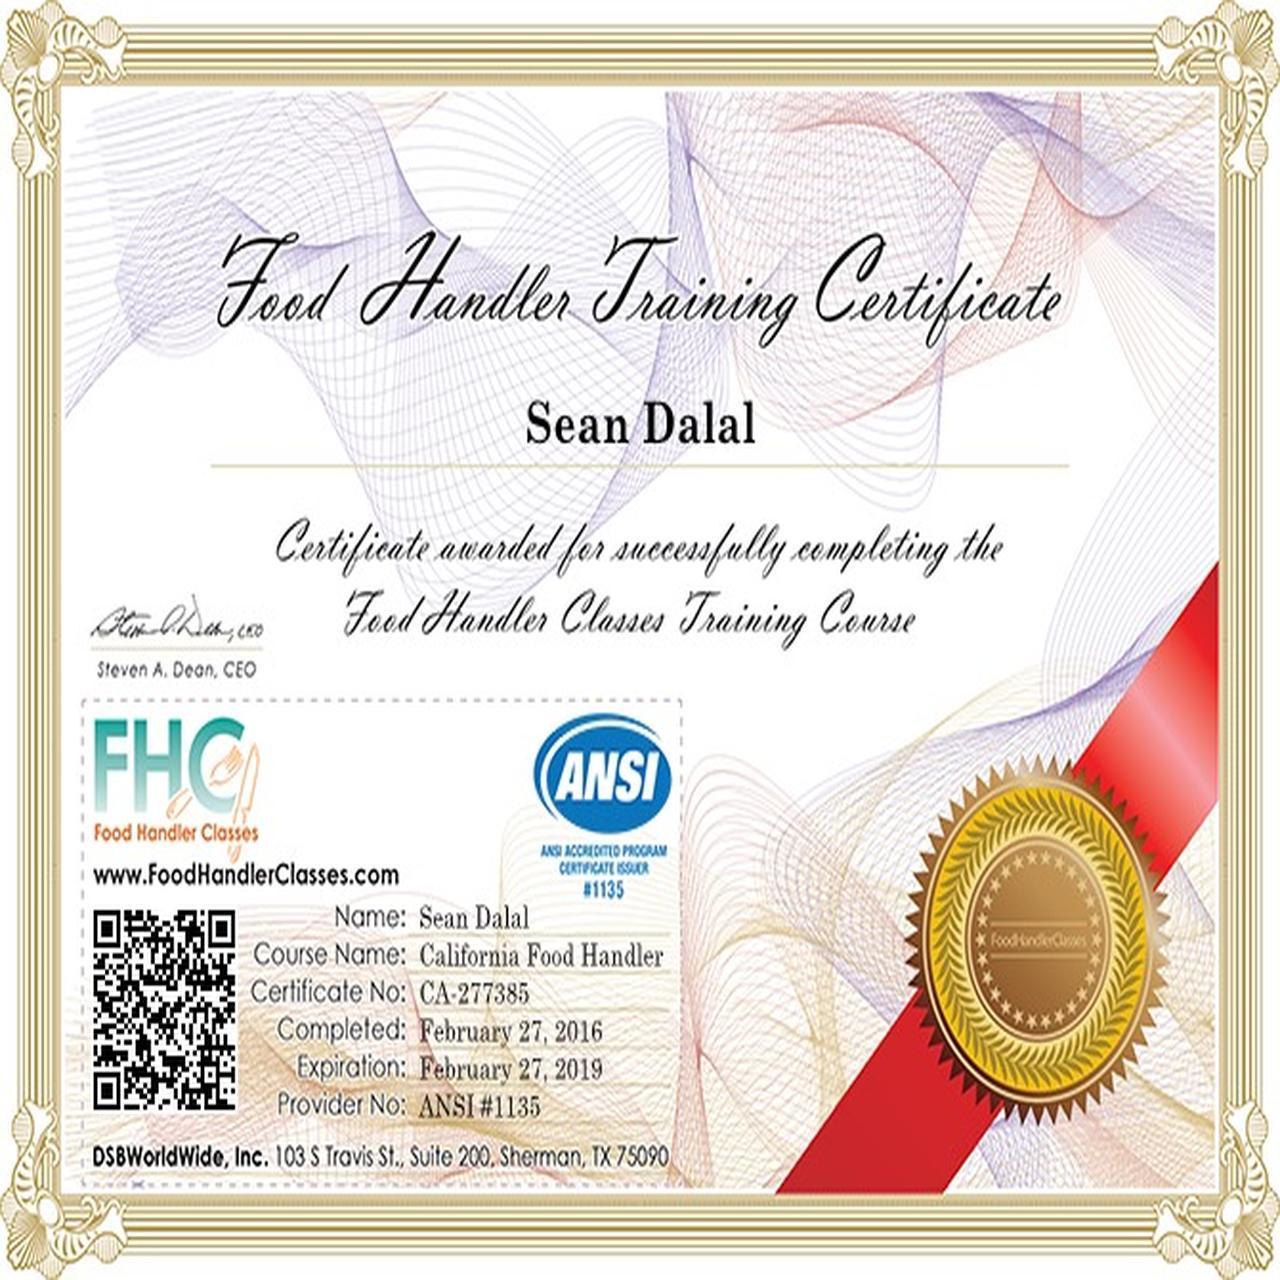 California food handler certificate harri 1betcityfo Gallery